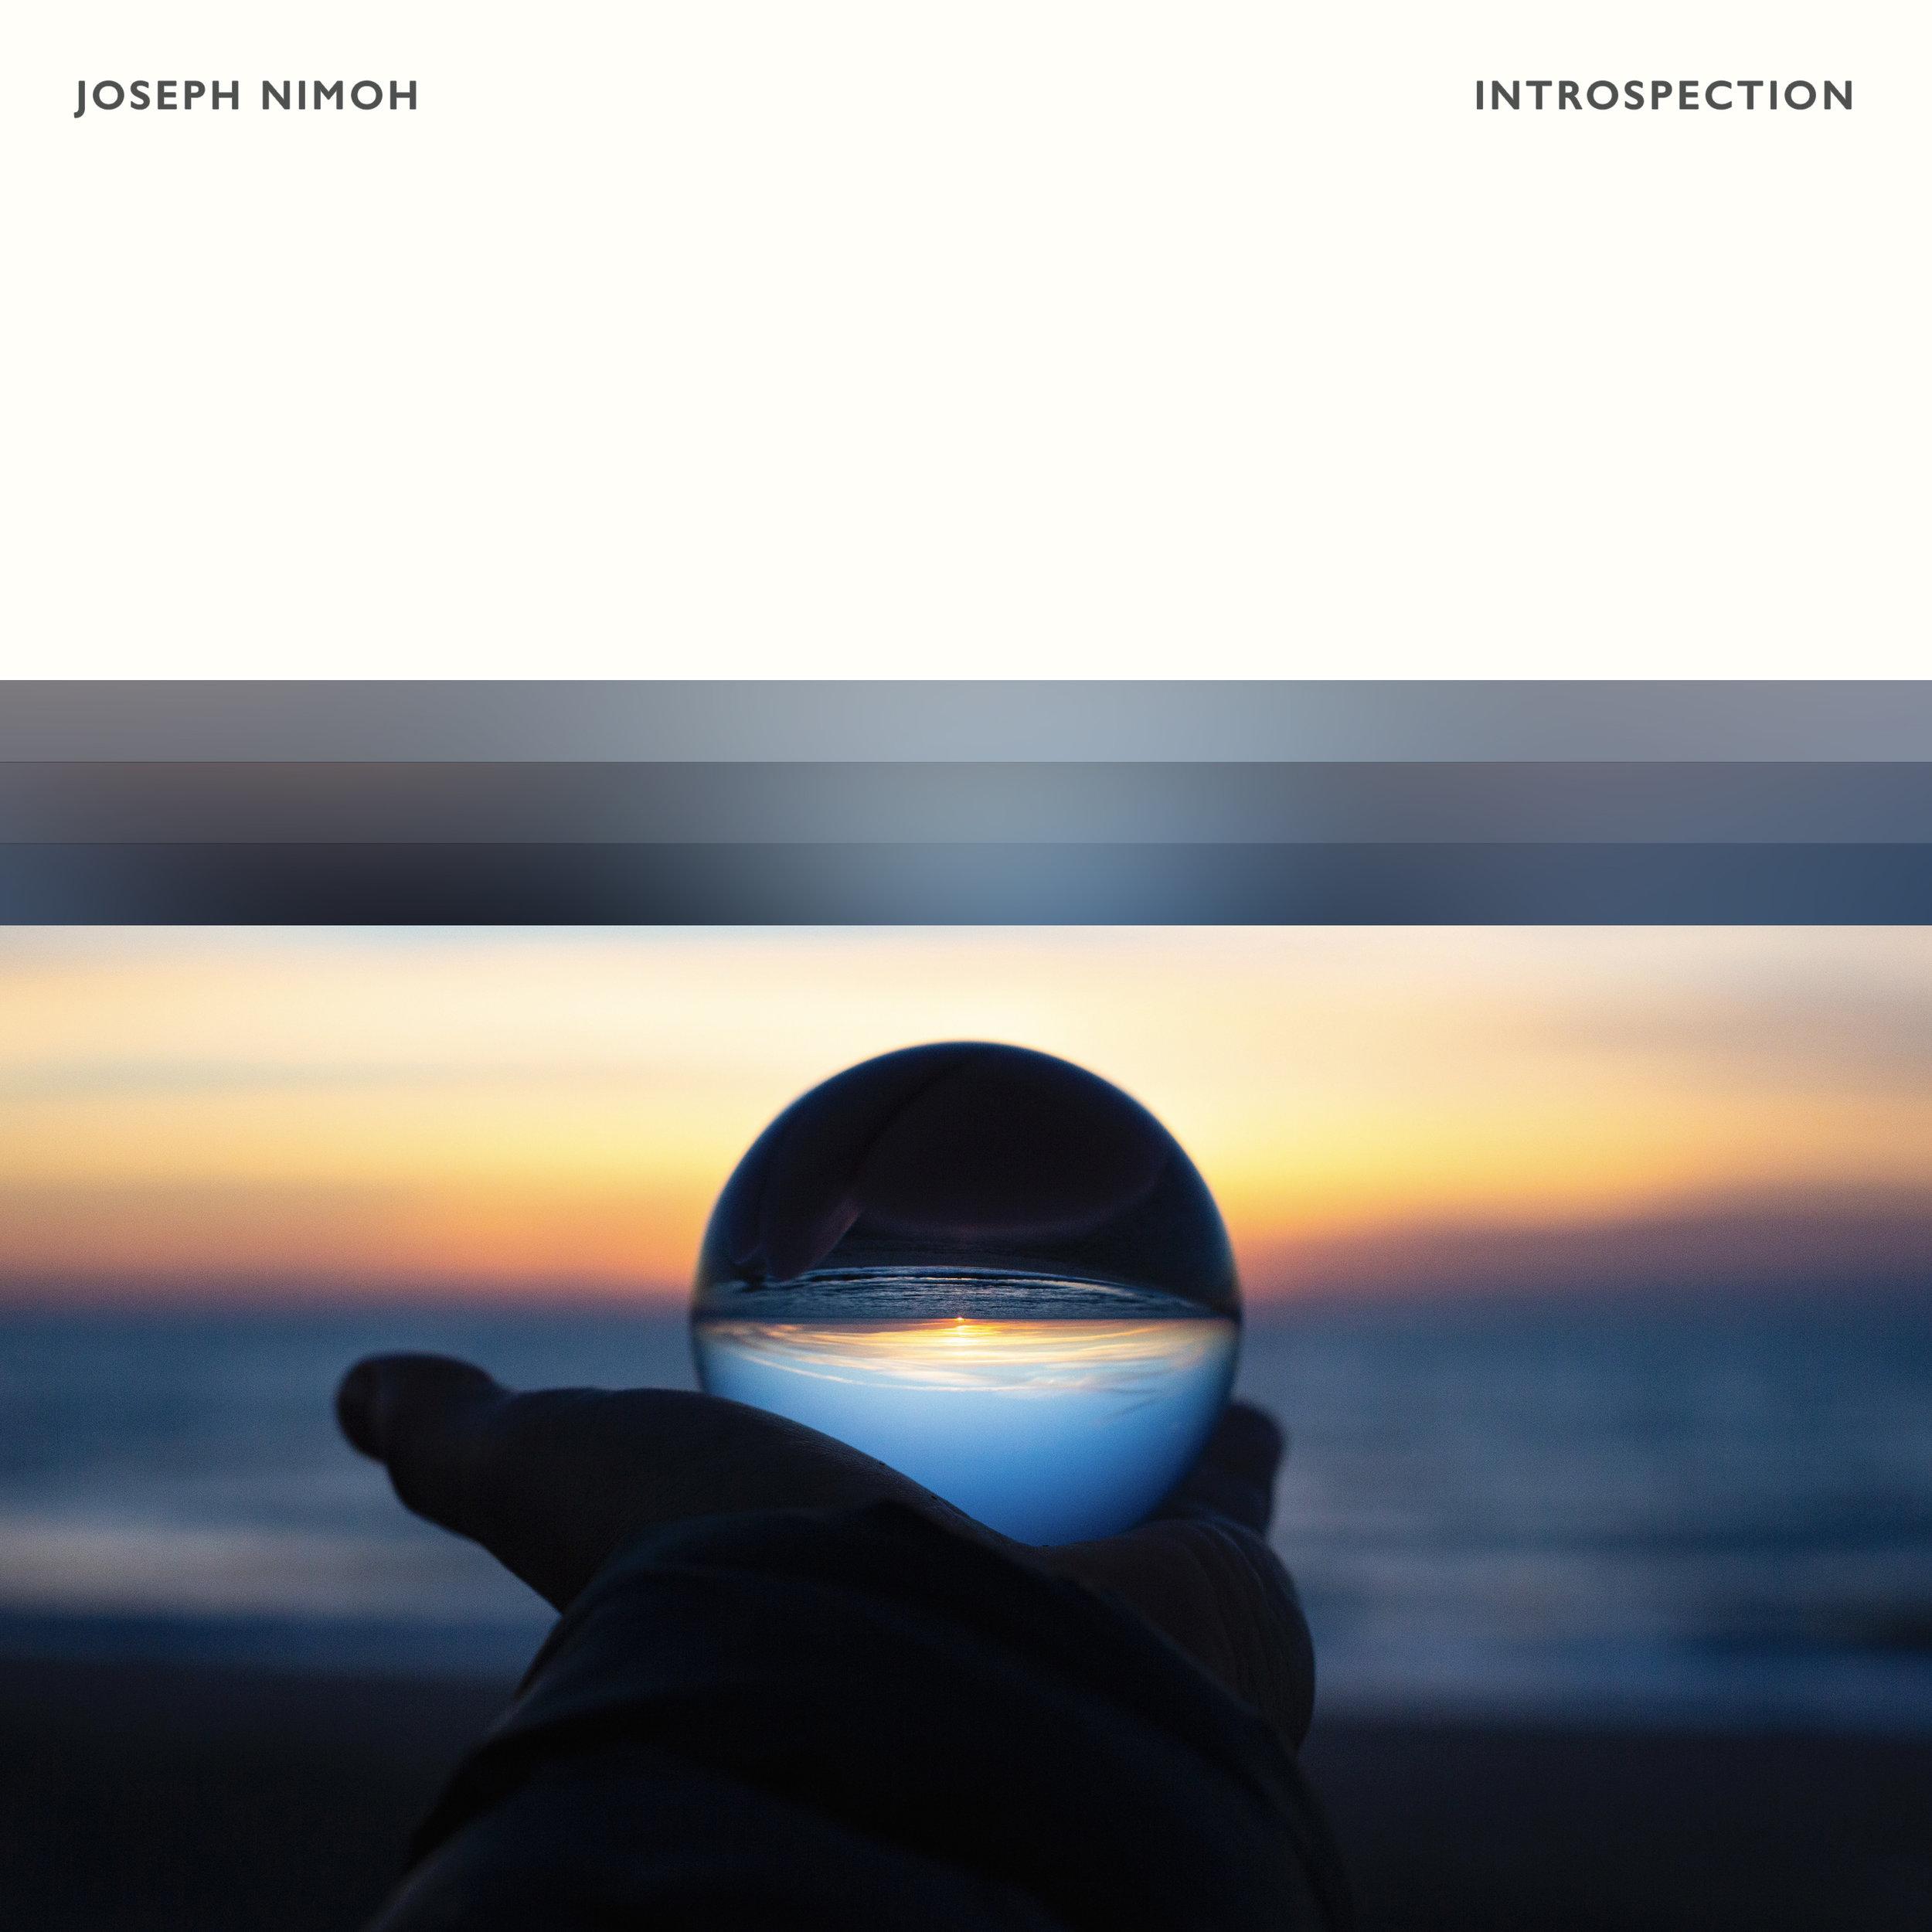 Joseph Nimoh - Introspection